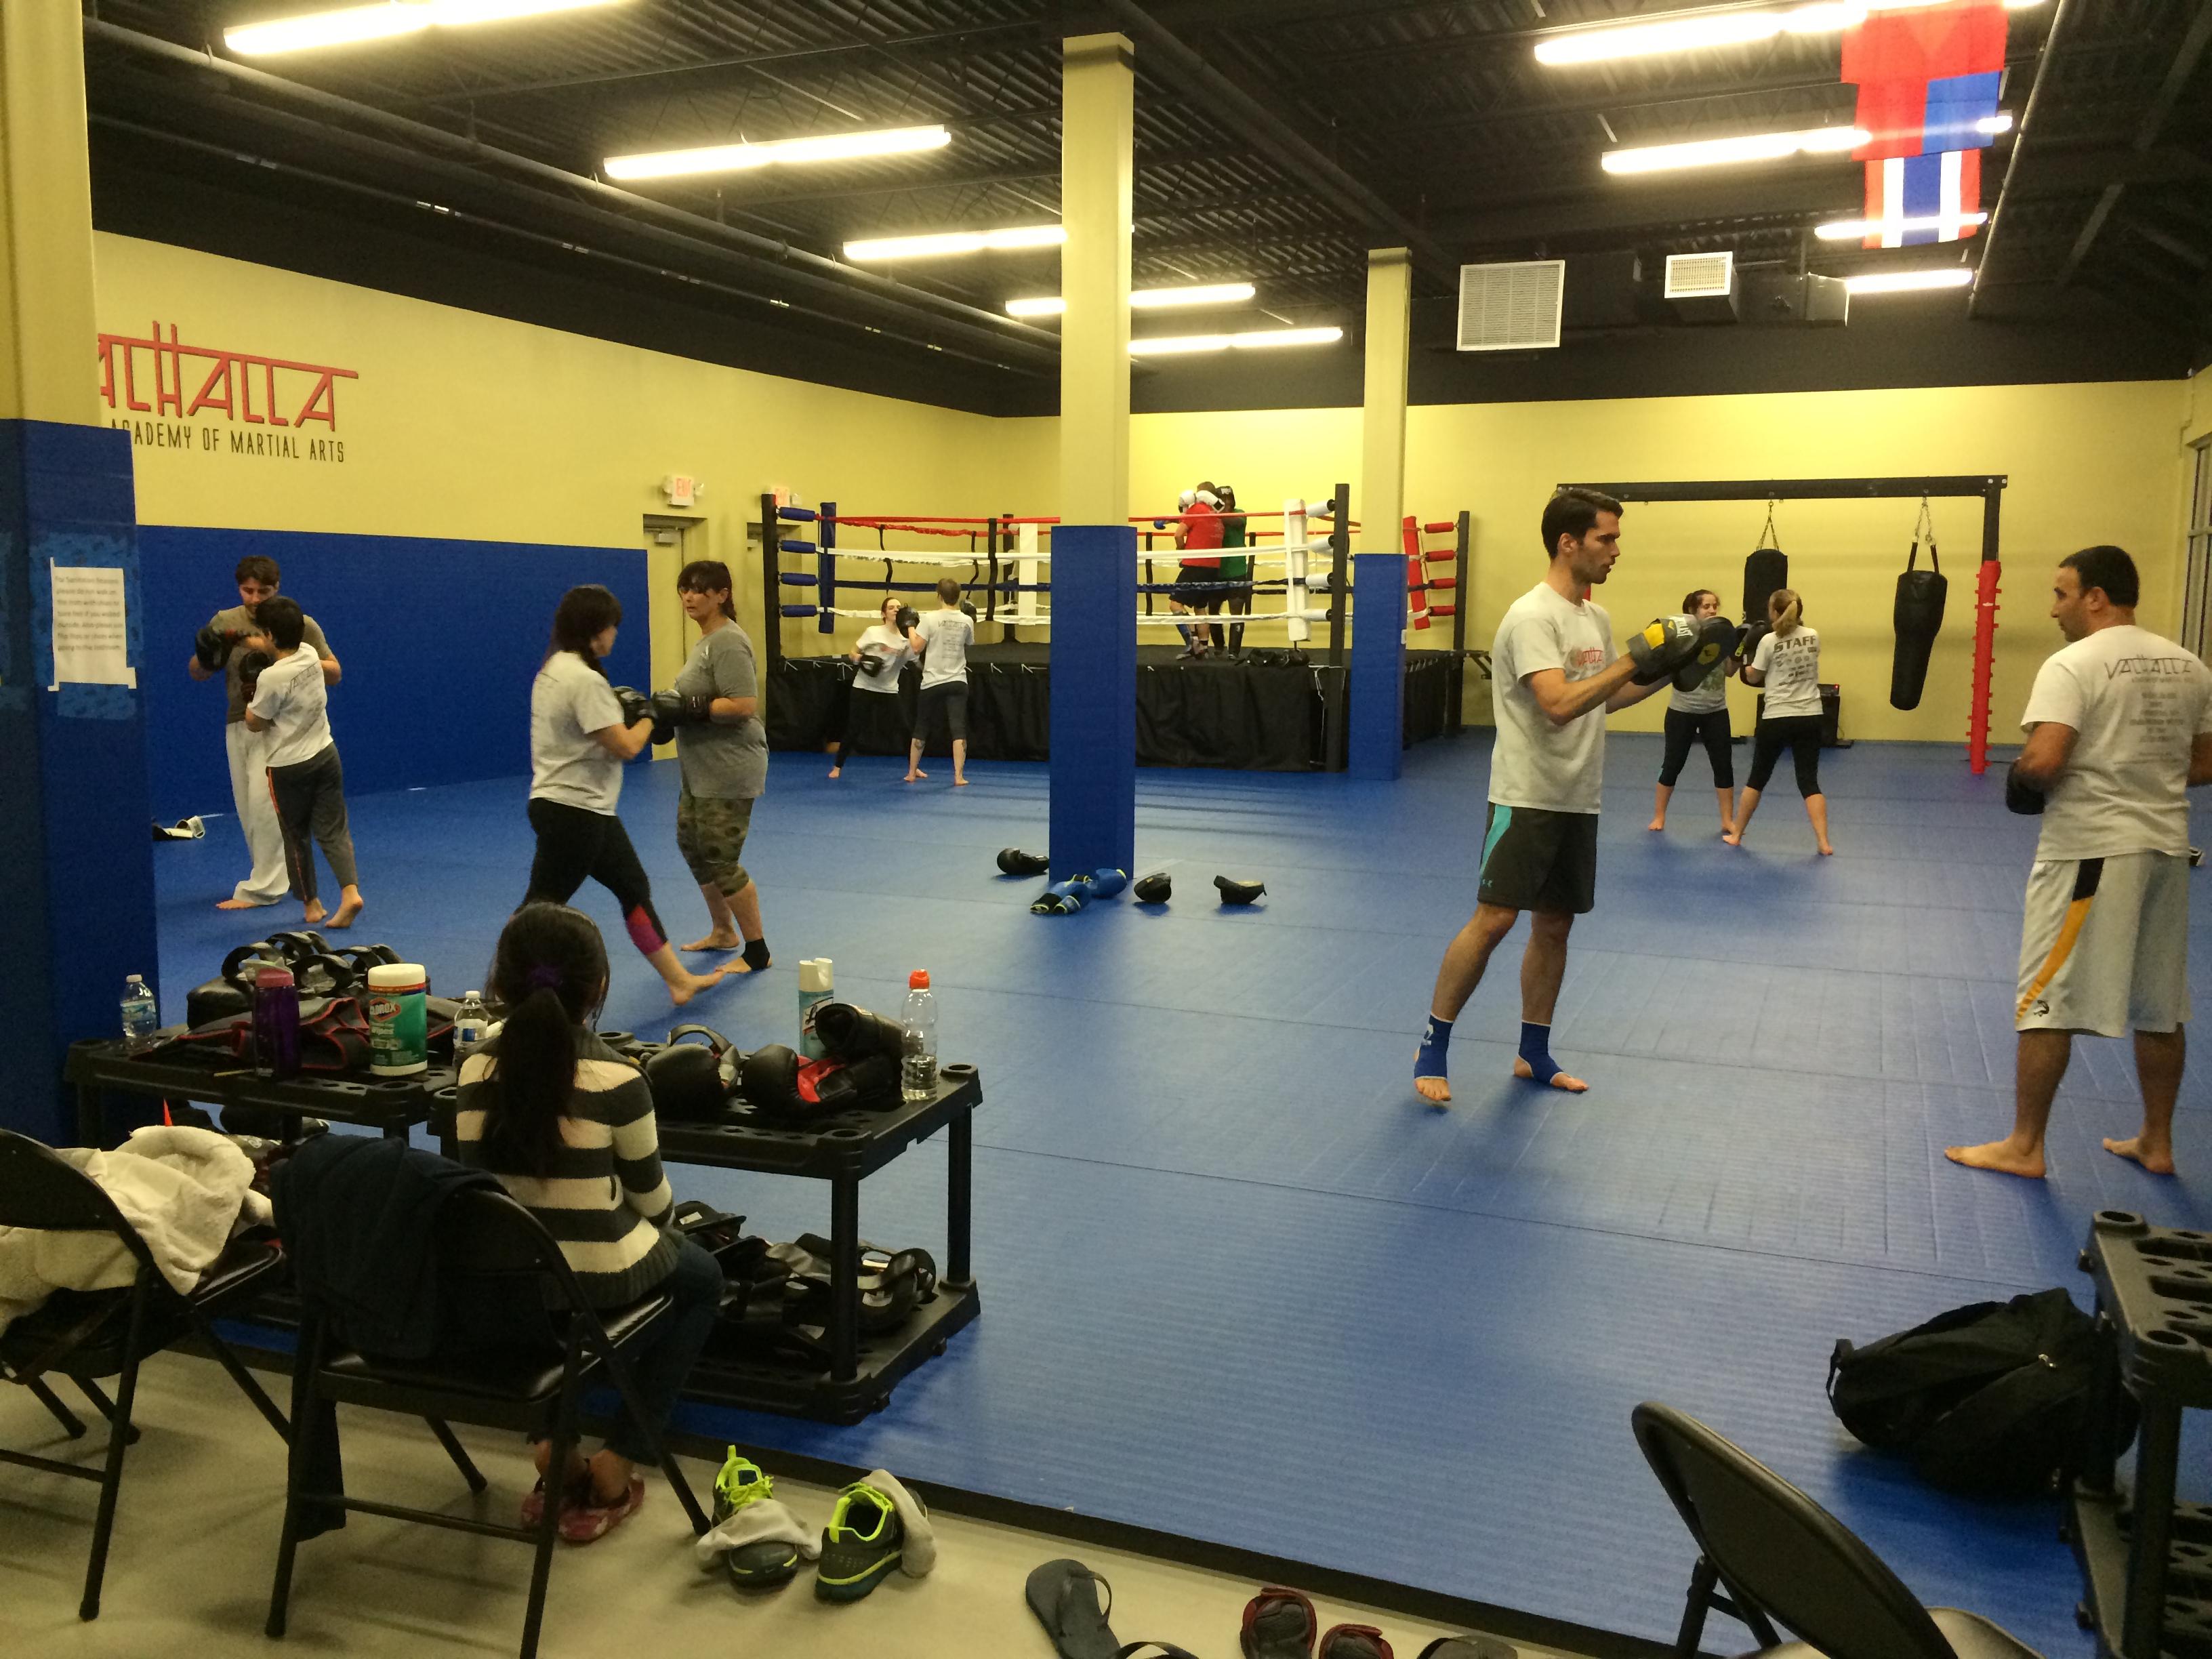 Valhalla Academy of Martial Arts image 9